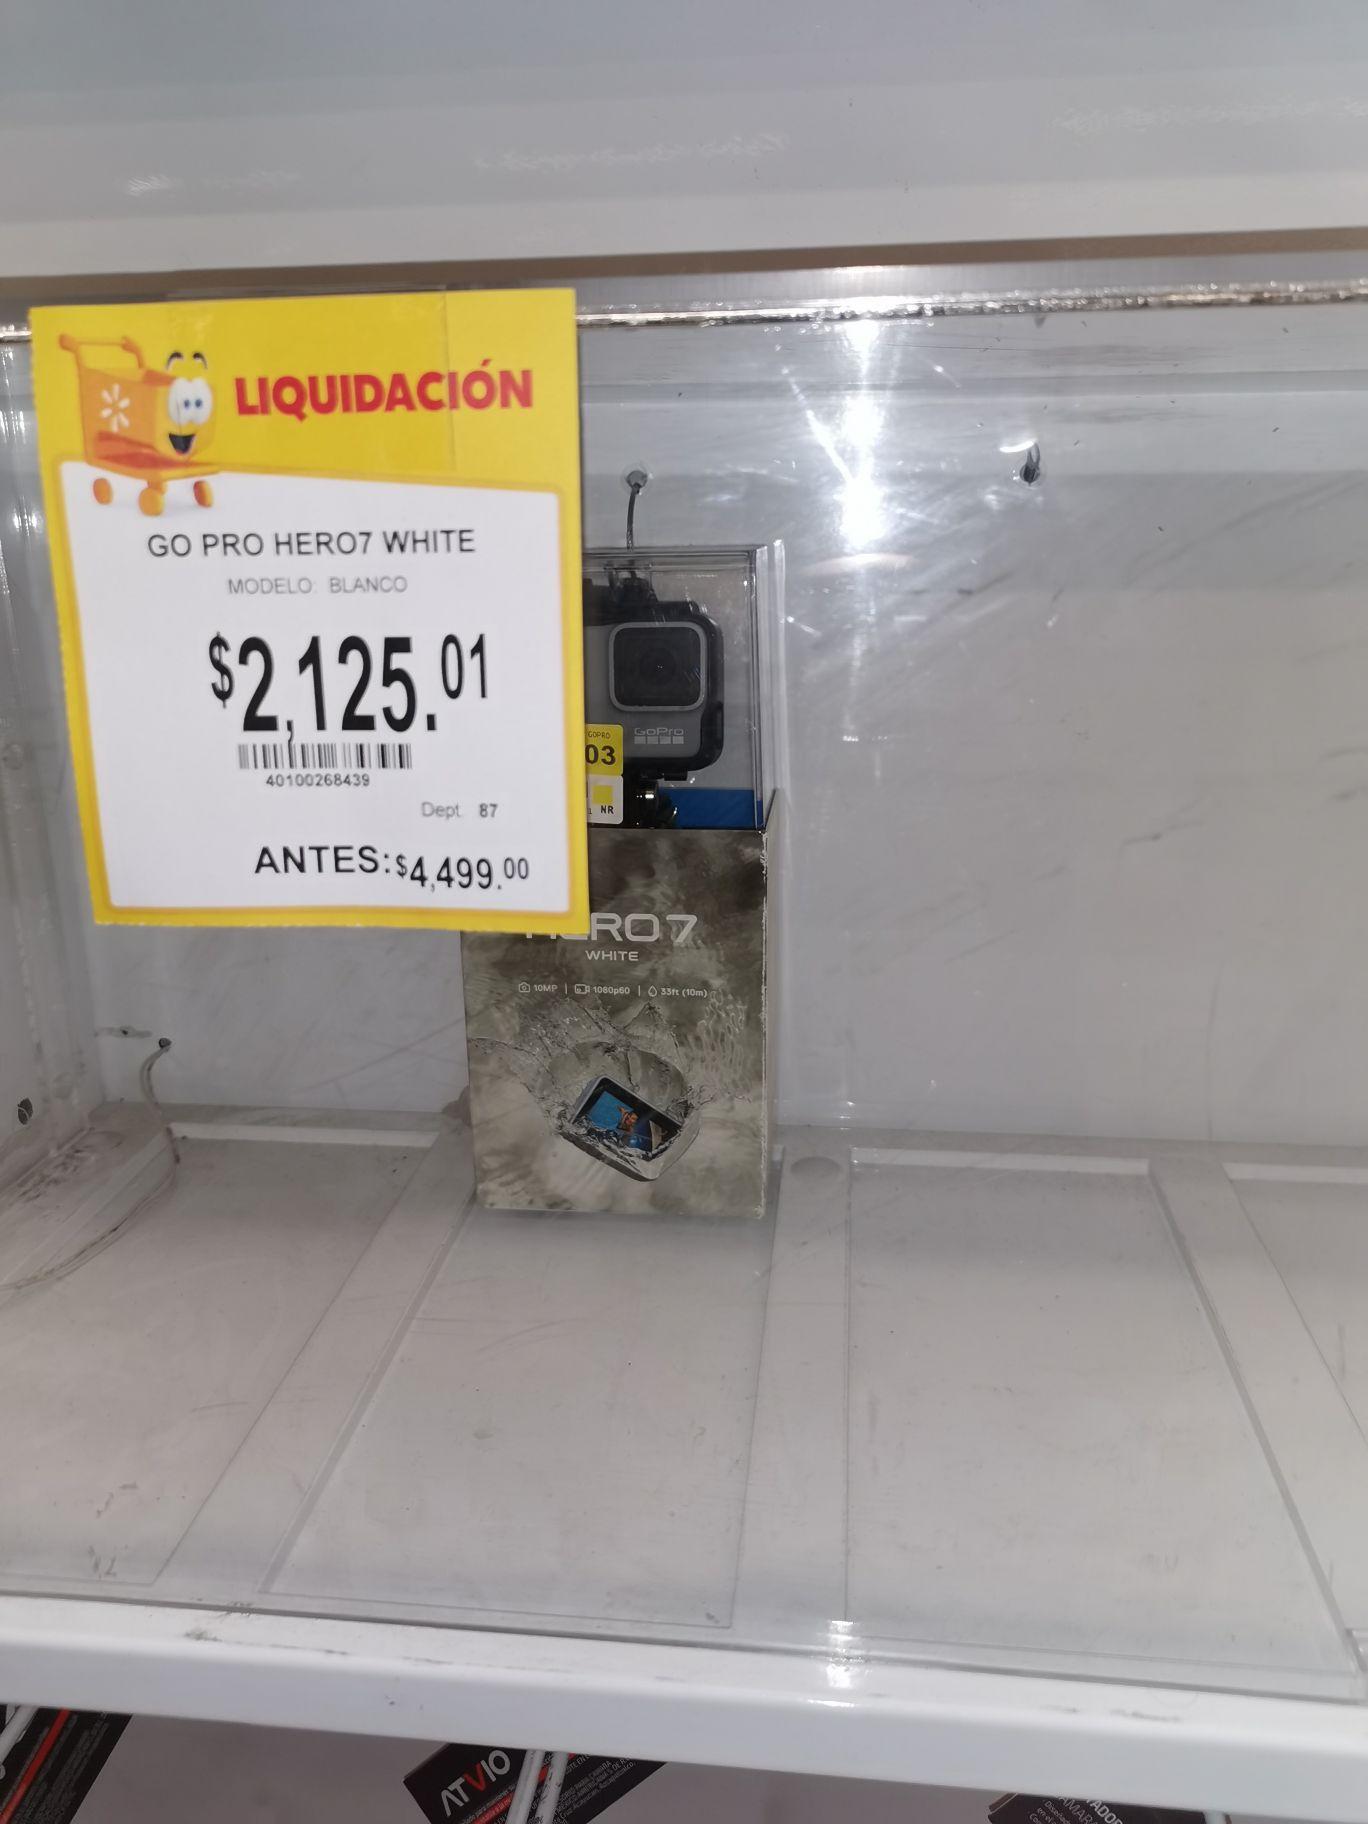 go pro hero 7 Walmart acapulco